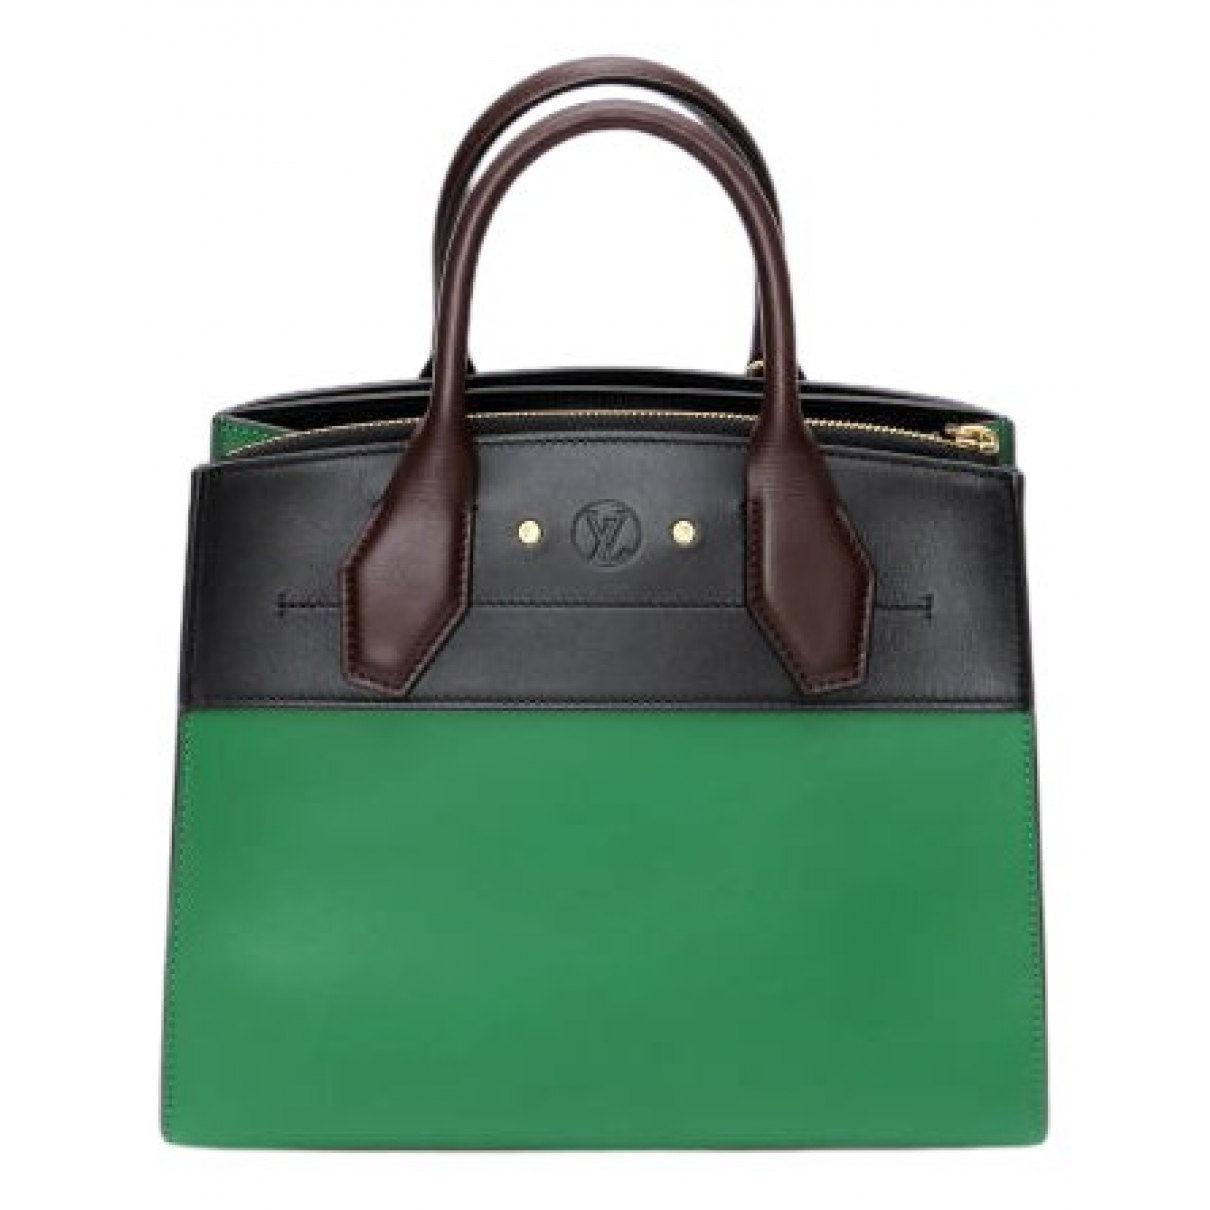 Louis Vuitton City Steamer Green Leather handbag for Women \N